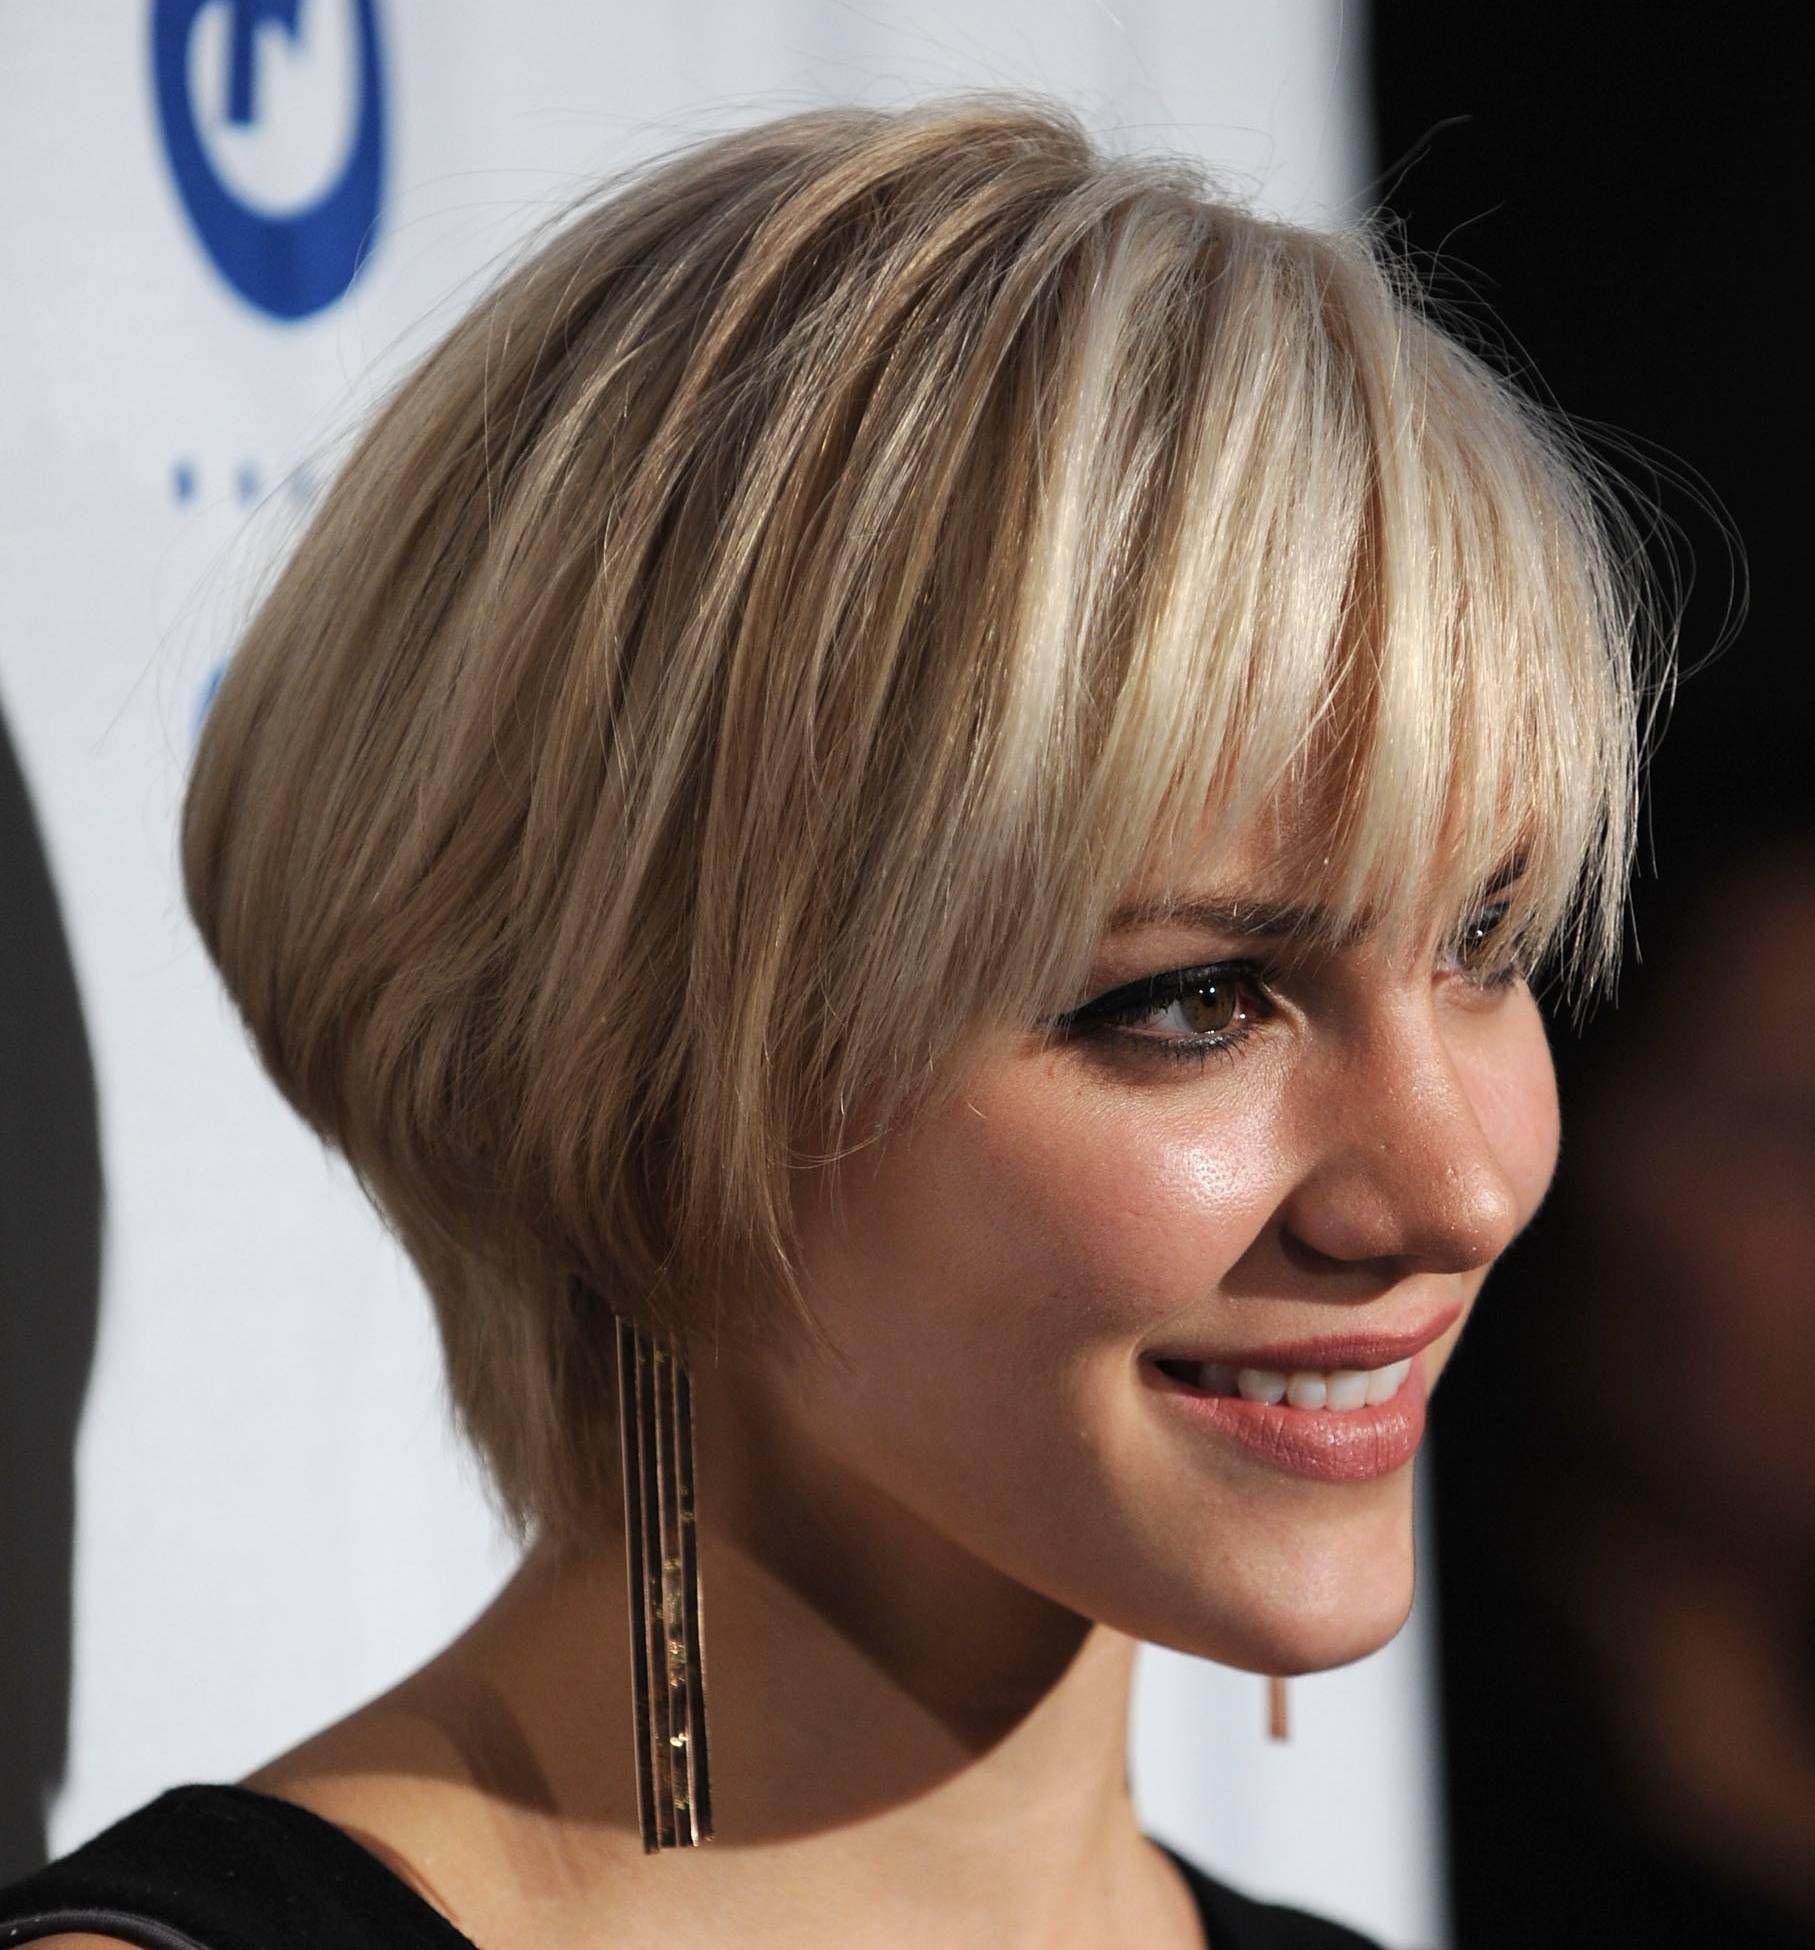 Hairstyles Short alert: katharine mcphees new look photos